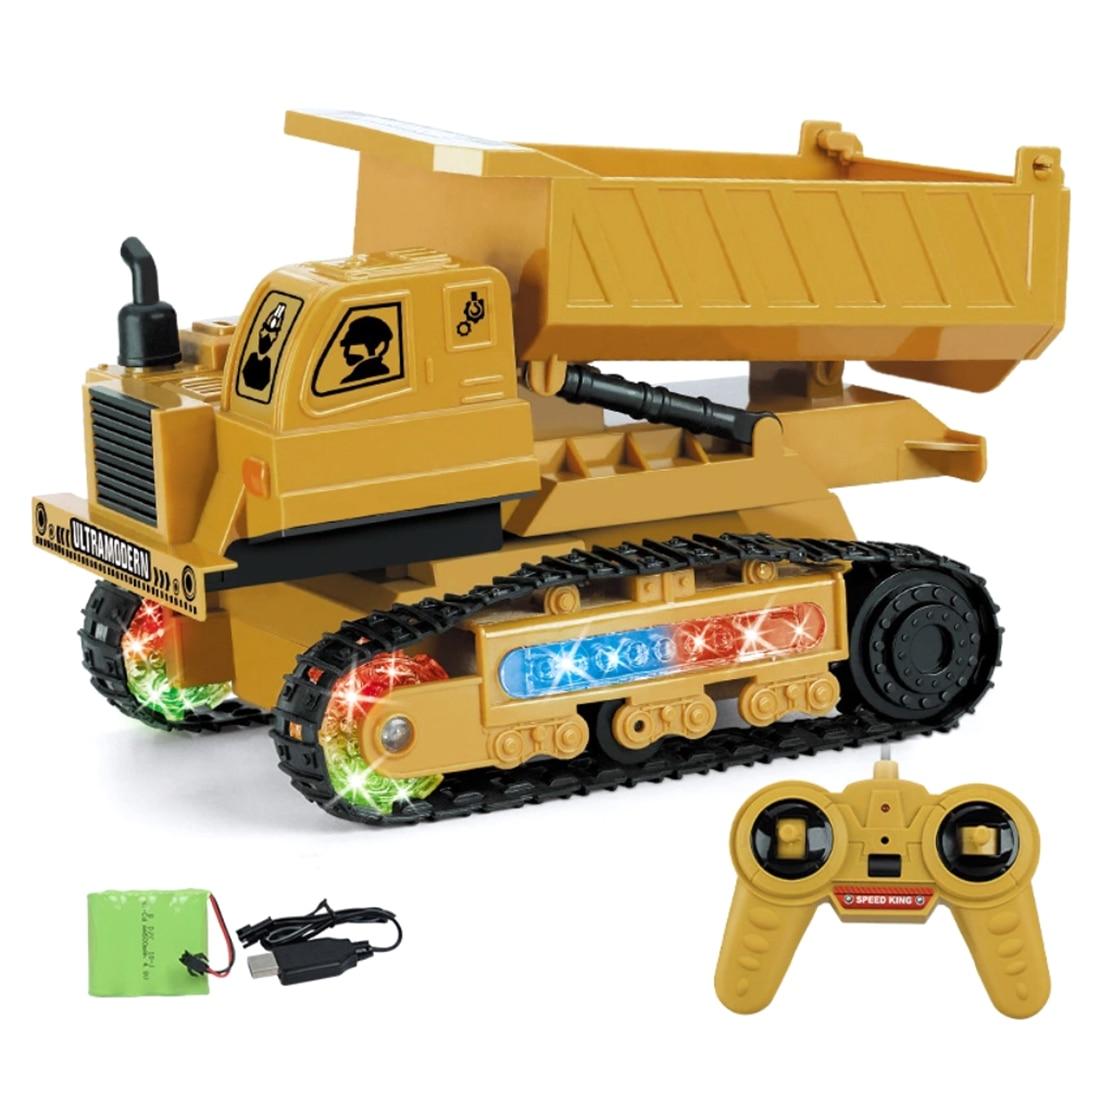 1:24 2.4G LED RC Engineer Vehicle Construction Truck Remote Control Toy Car Dump Truck Dumper Bulldozer Pushdozer  Model Car